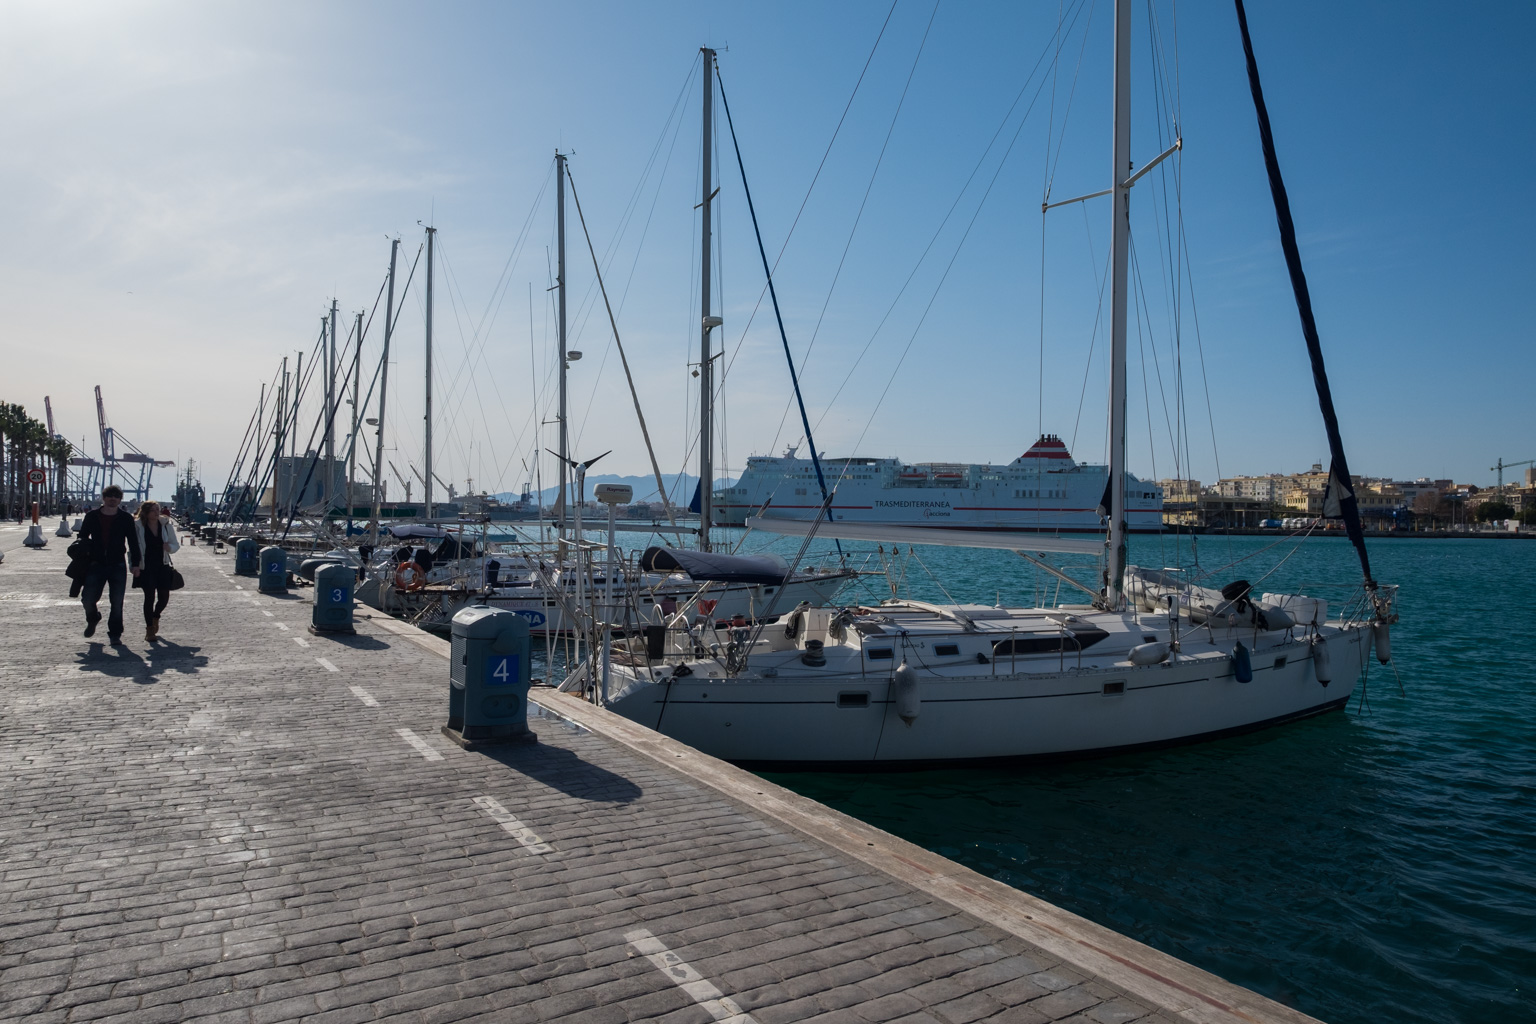 Malaga-hamnen